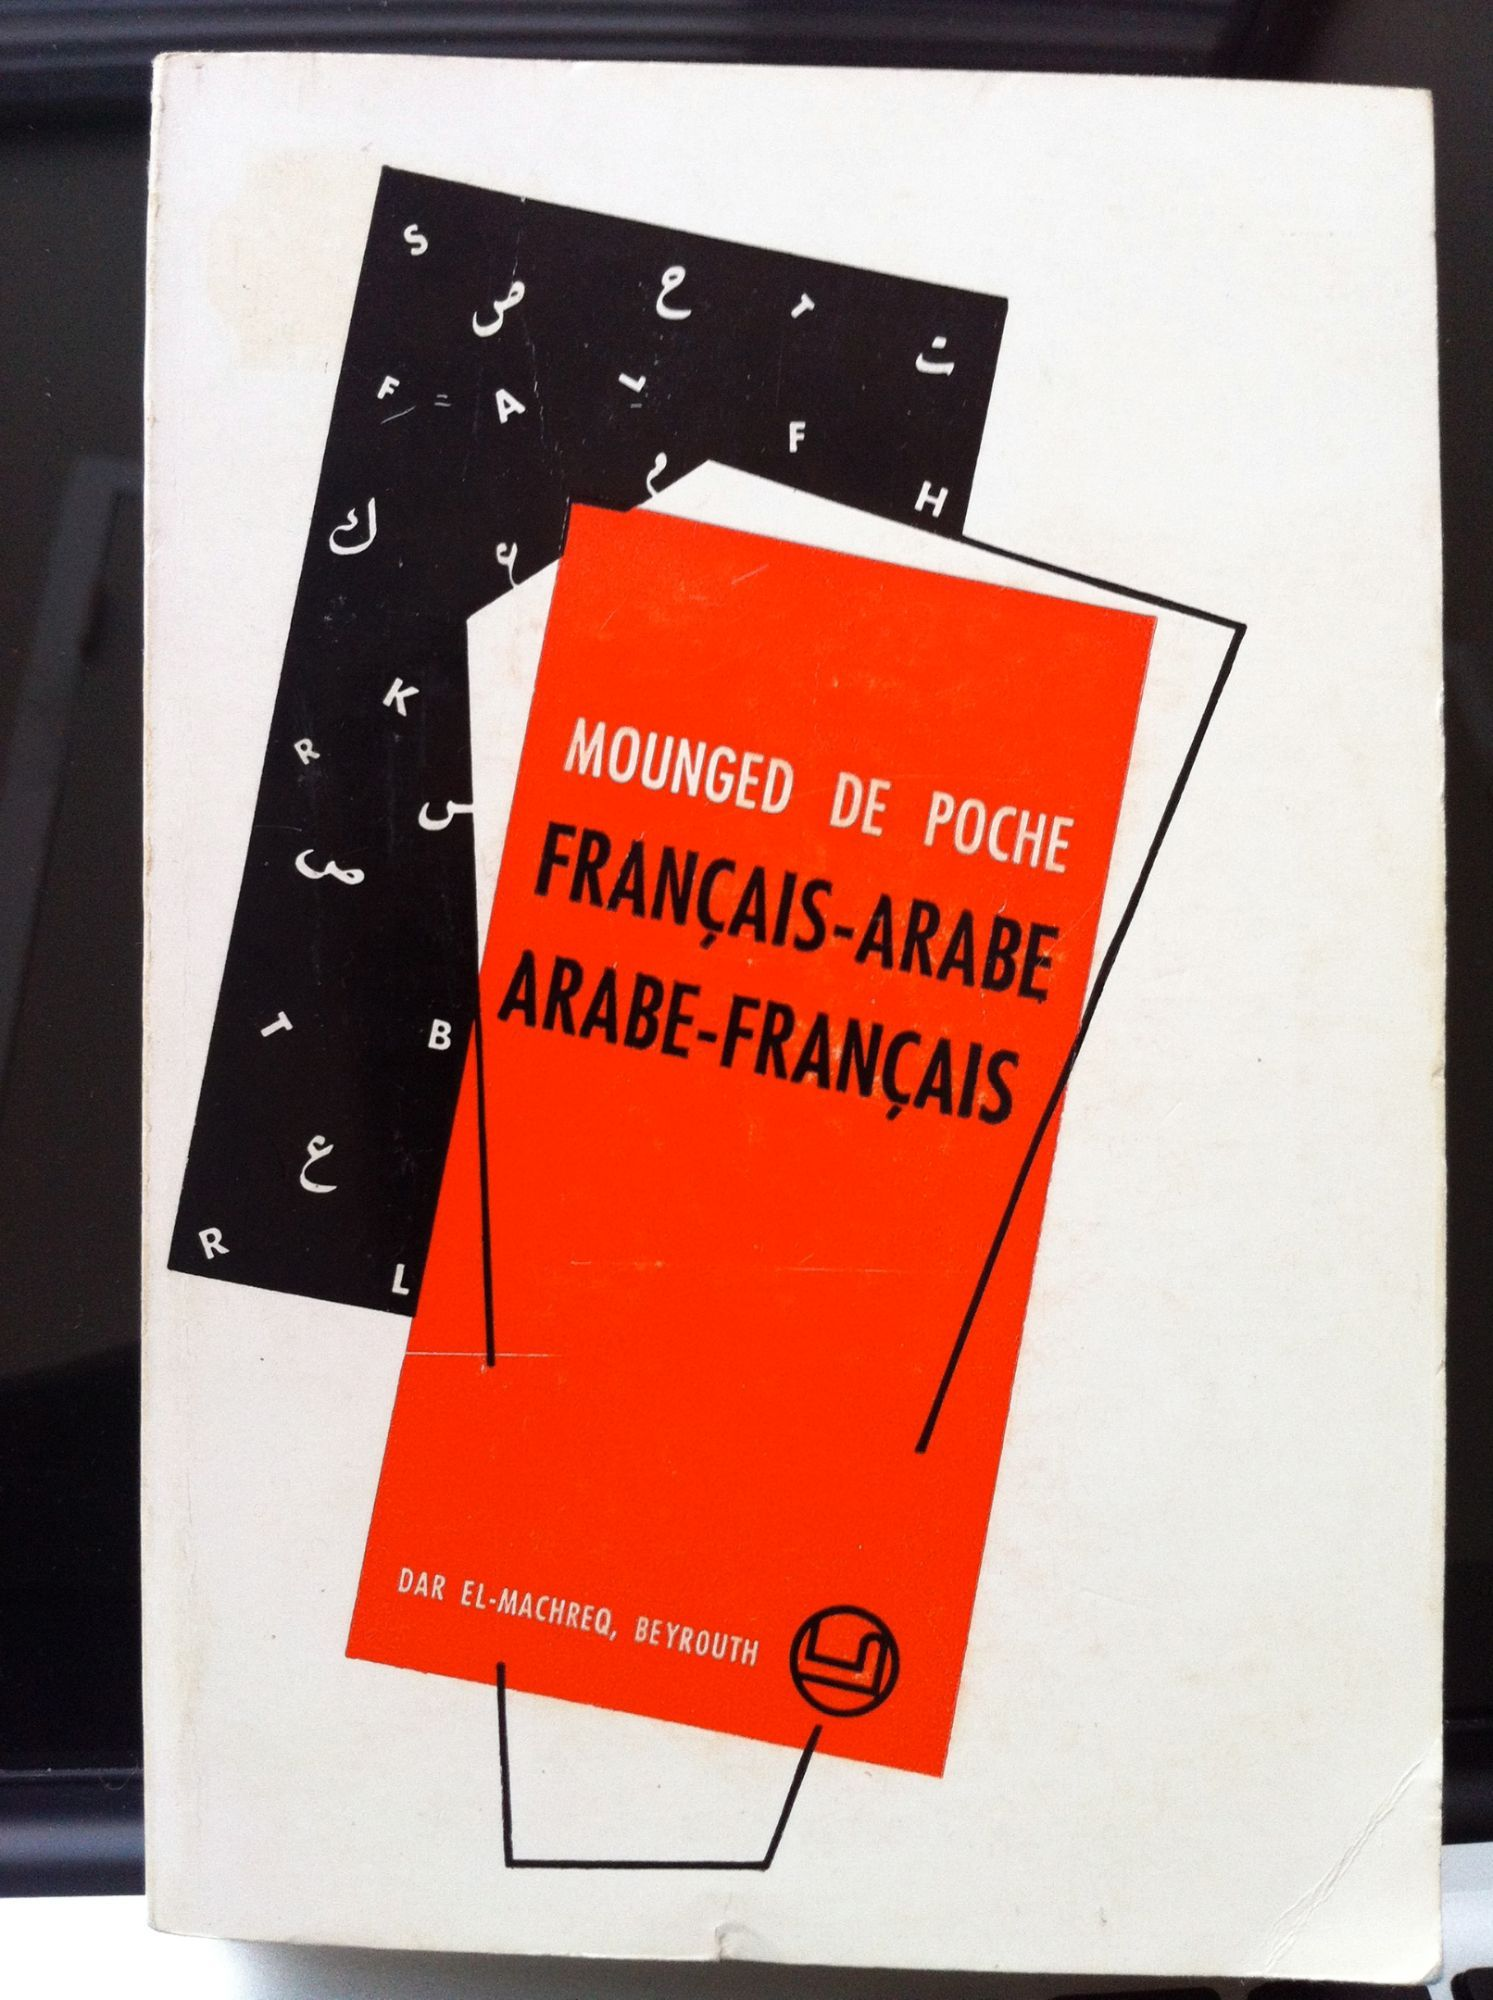 Mounged de poche. français-arabe